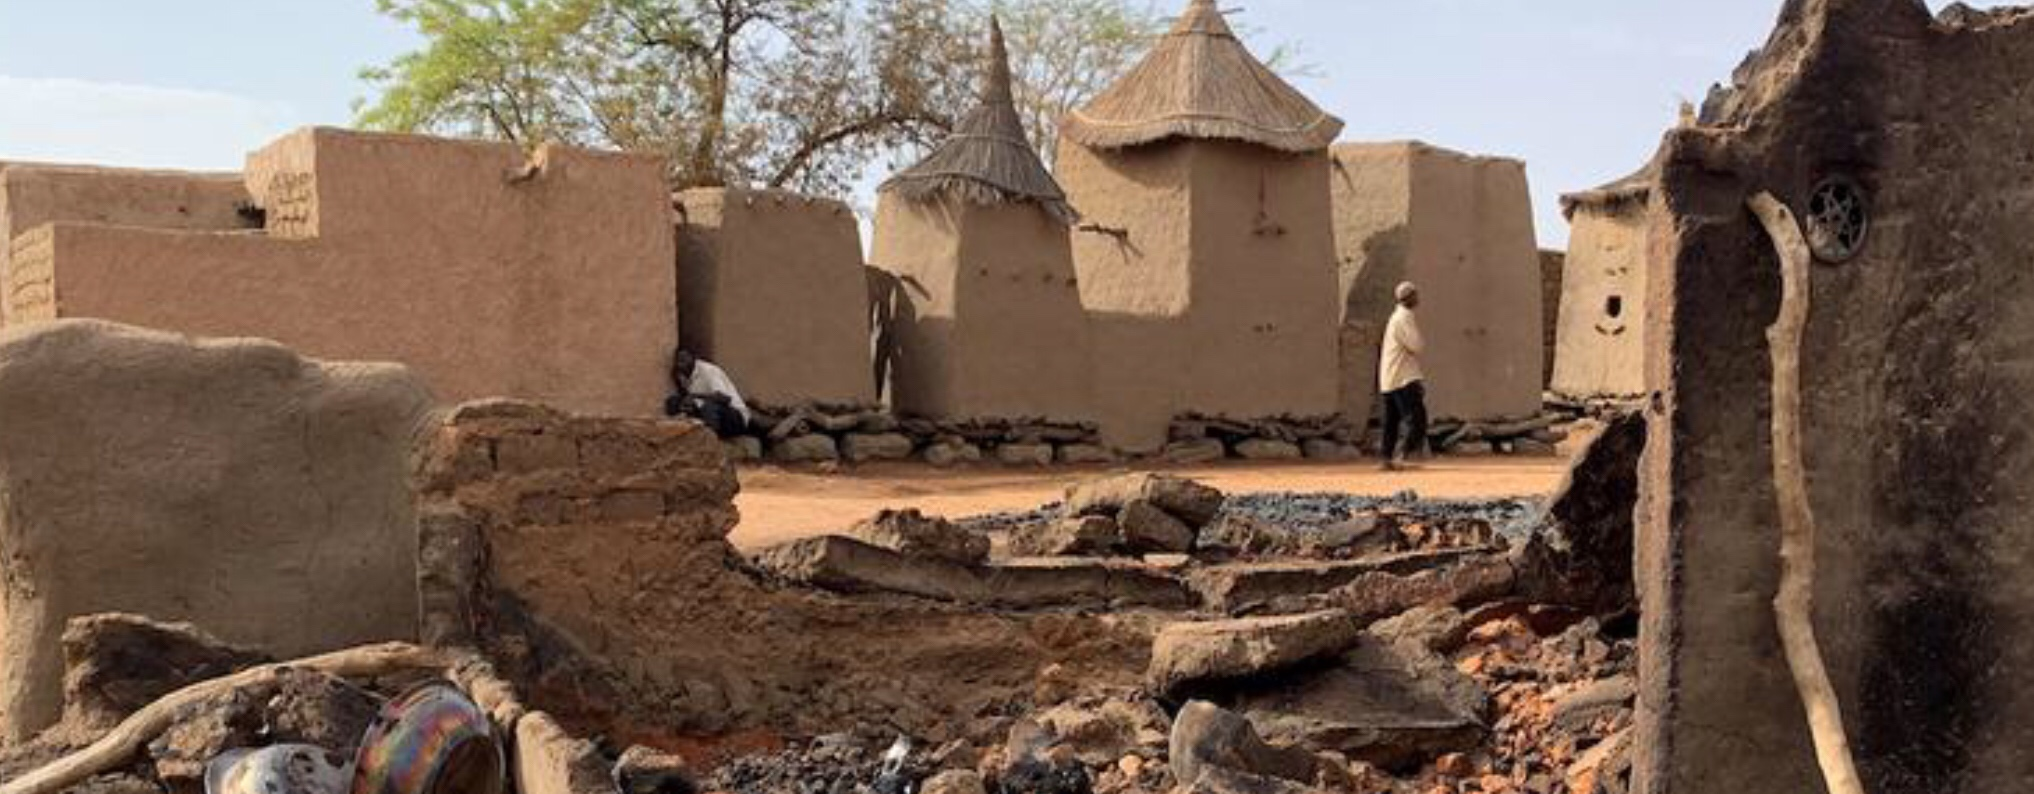 Mali: Dogon village attacked